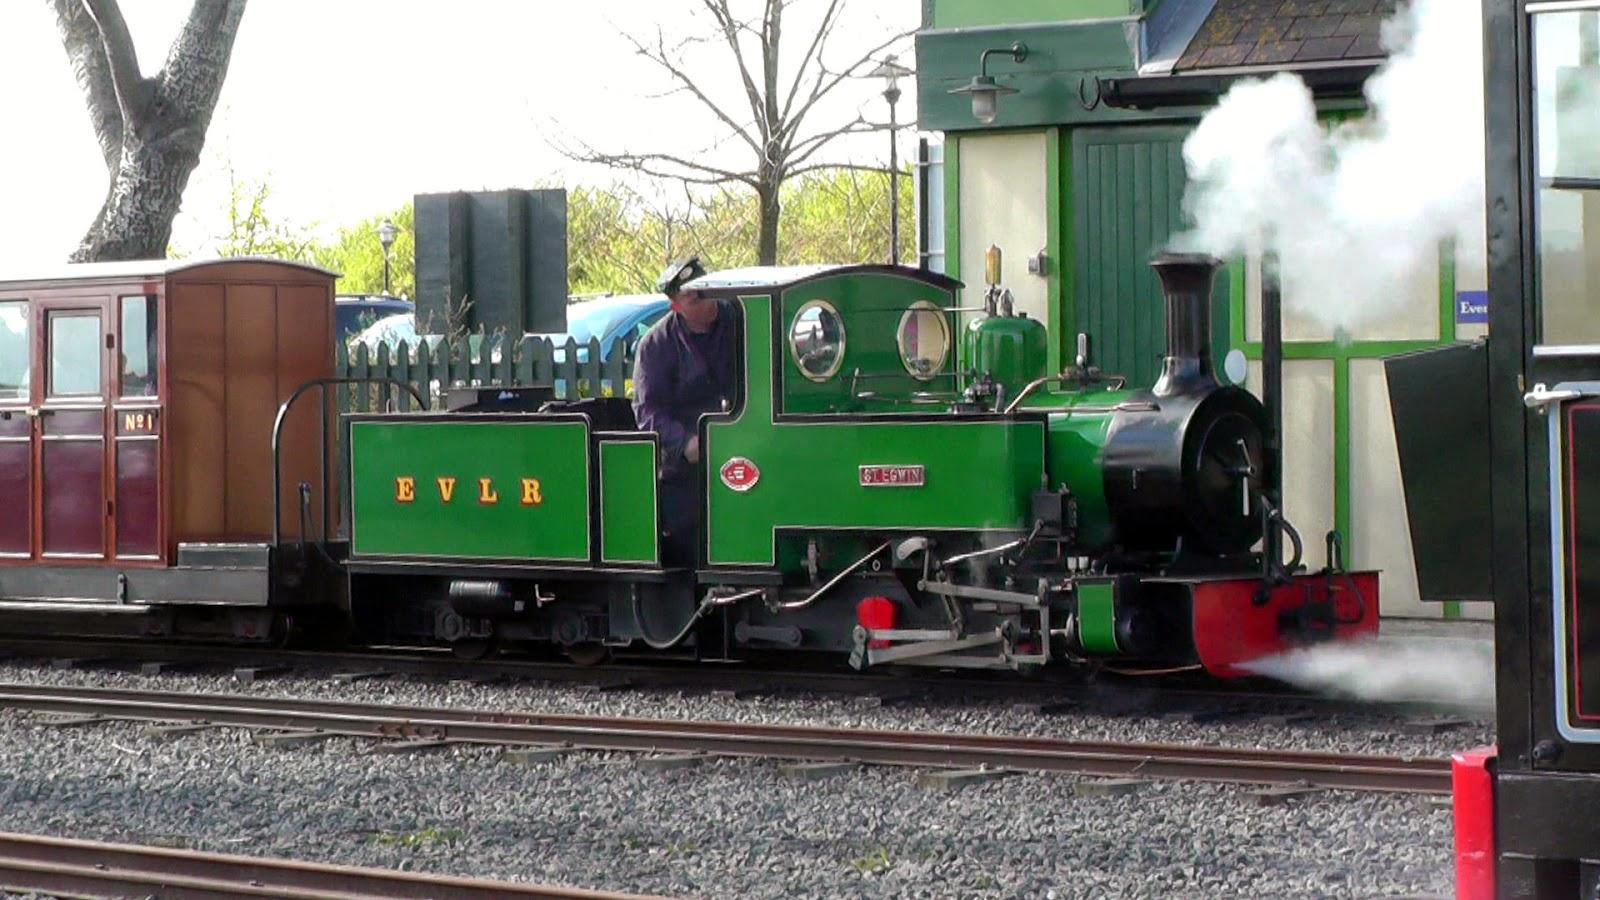 I found the Evesham Vale Light Railway